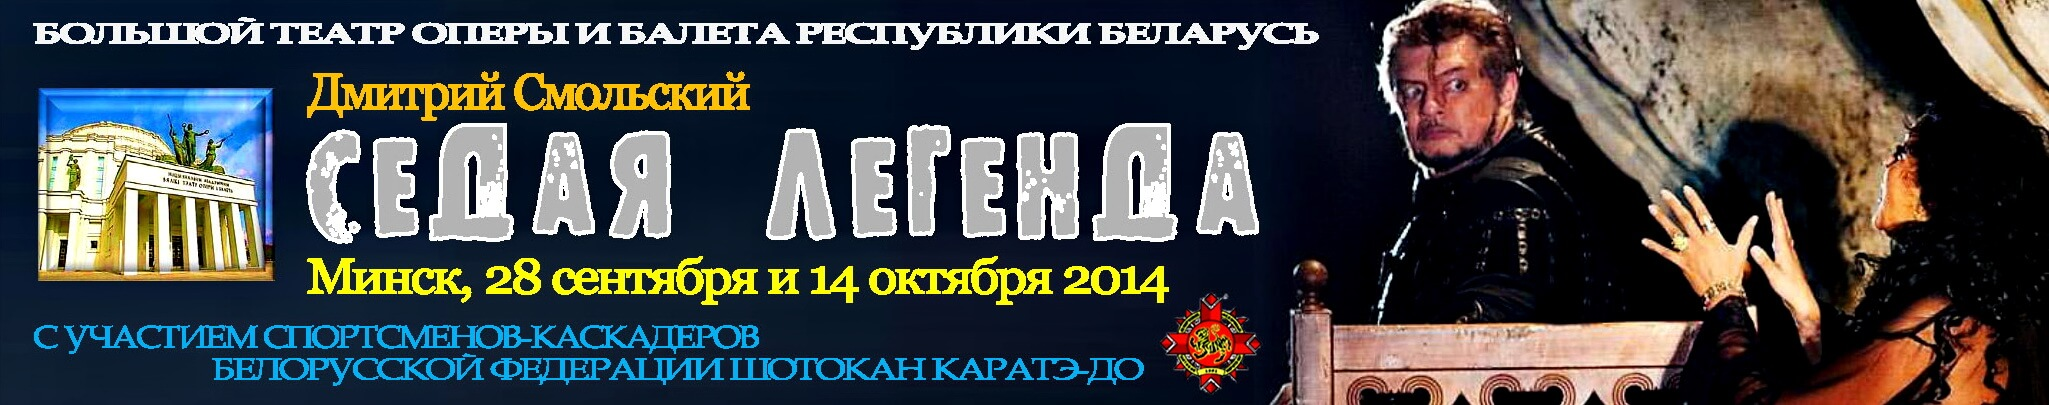 Седая легенда 2014-09 2014-10 Баннер